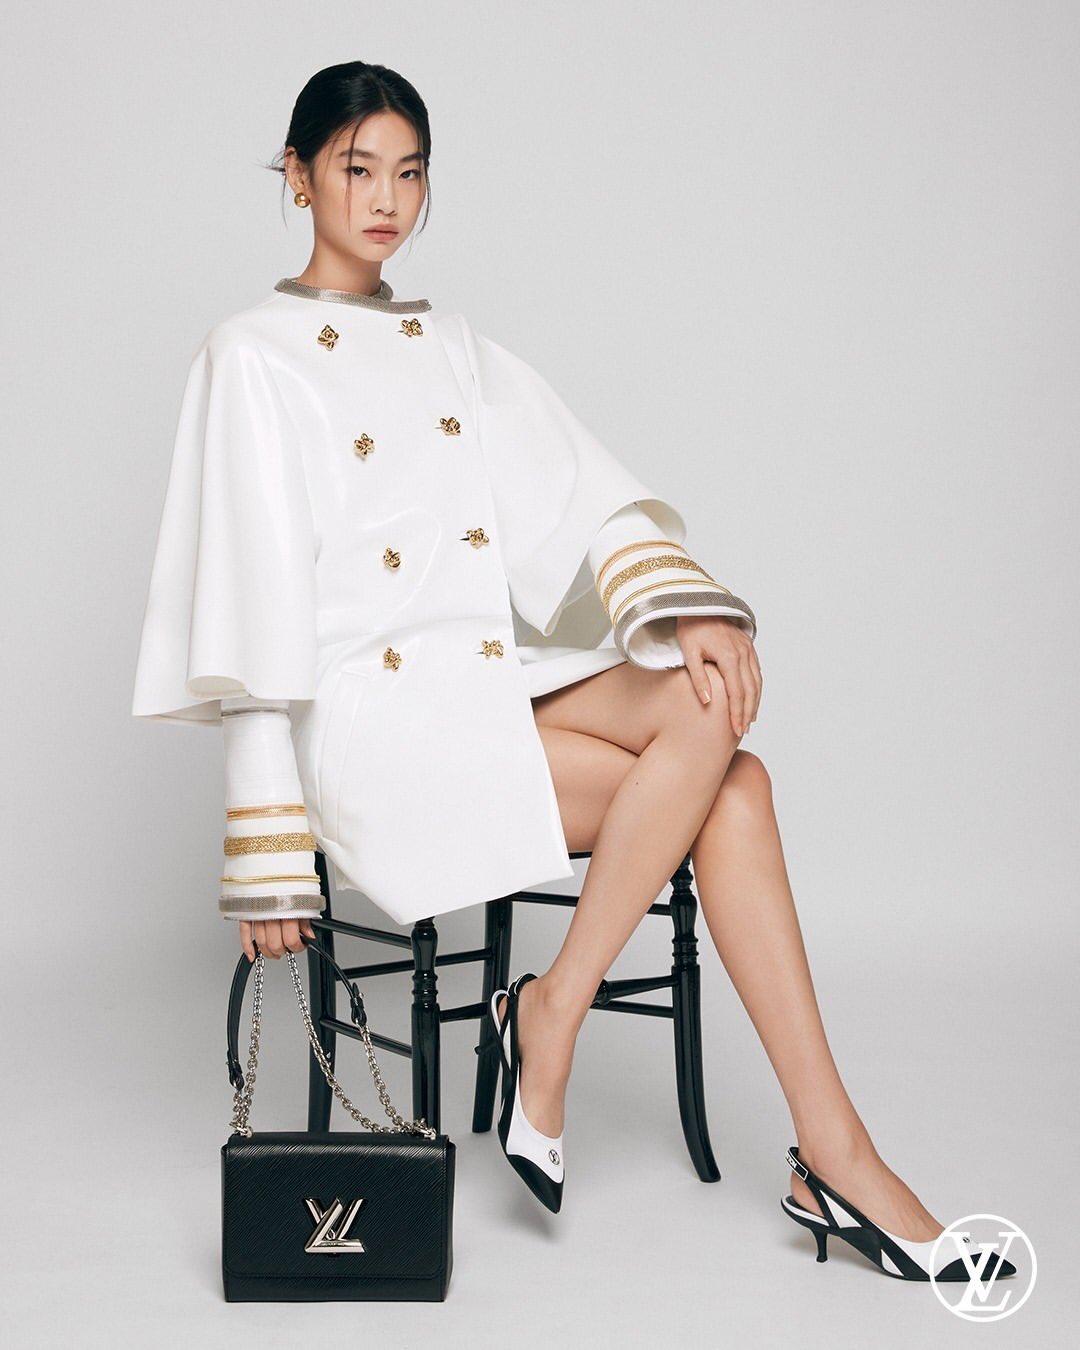 louis vuitton'ın yeni küresel marka elçisi belli: jung hoyeon